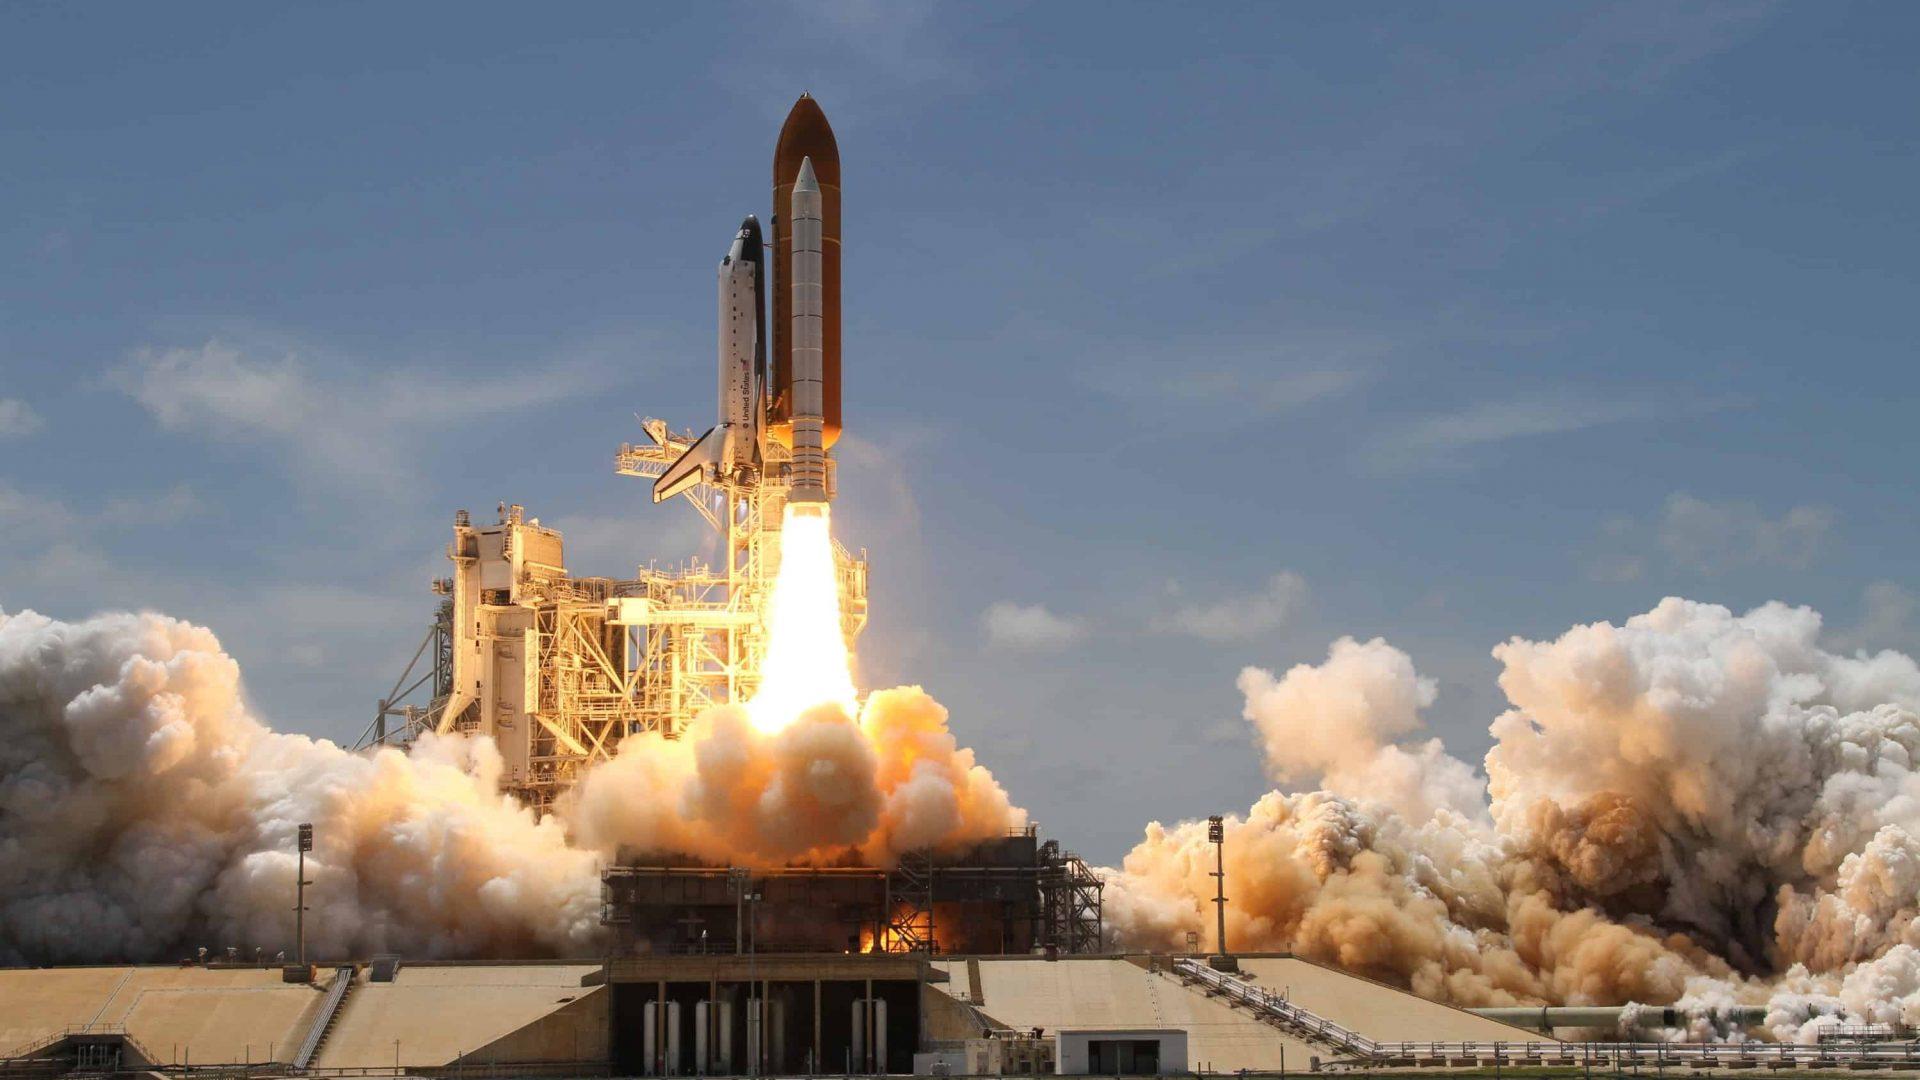 astronomy-explosion-flight-2166